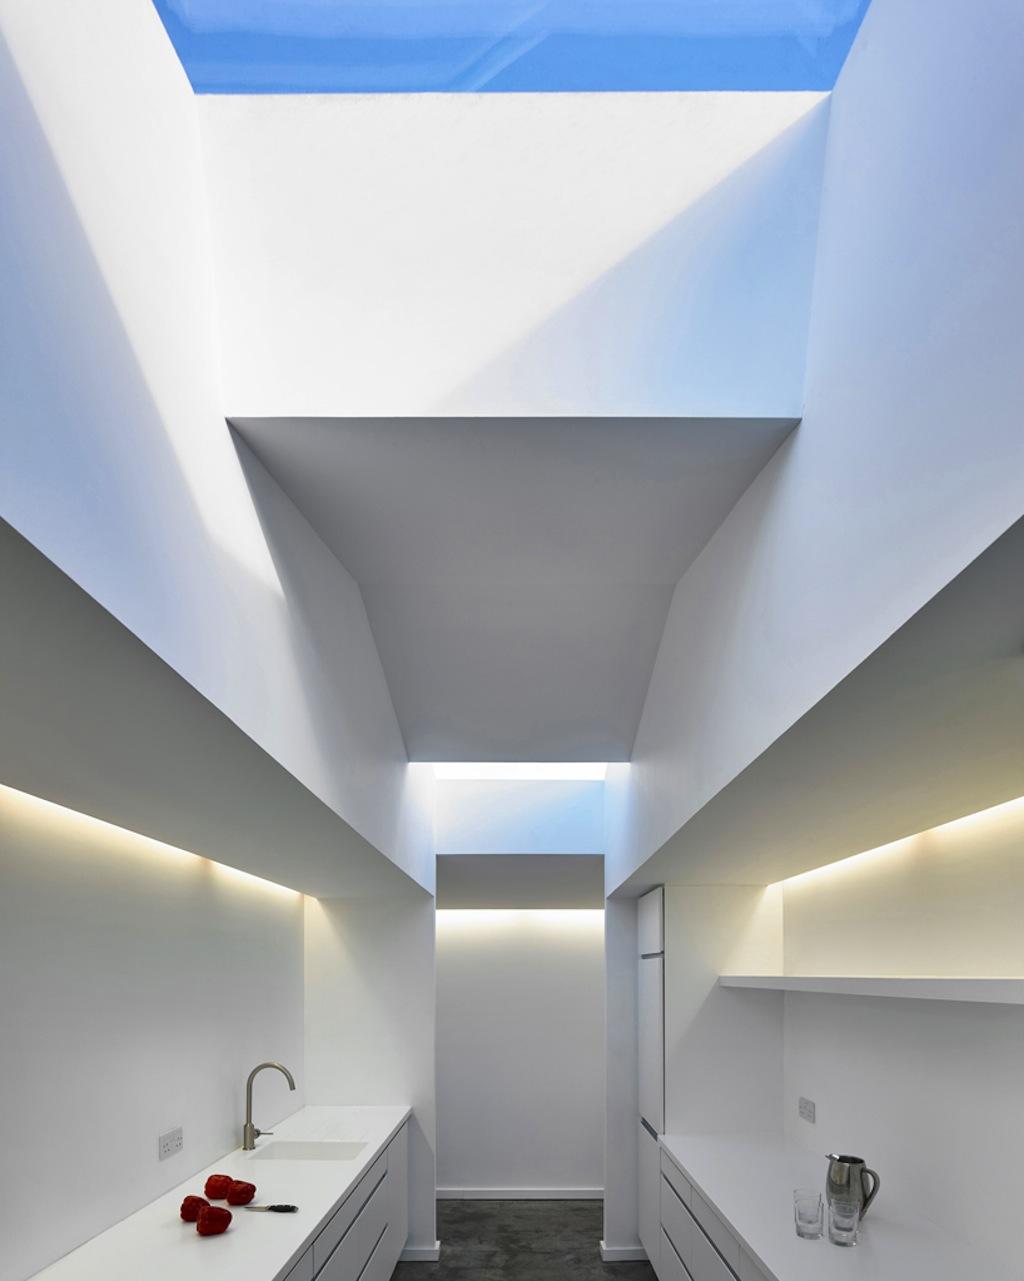 beach-house-in-morar-dualchas-architects-designboom-08